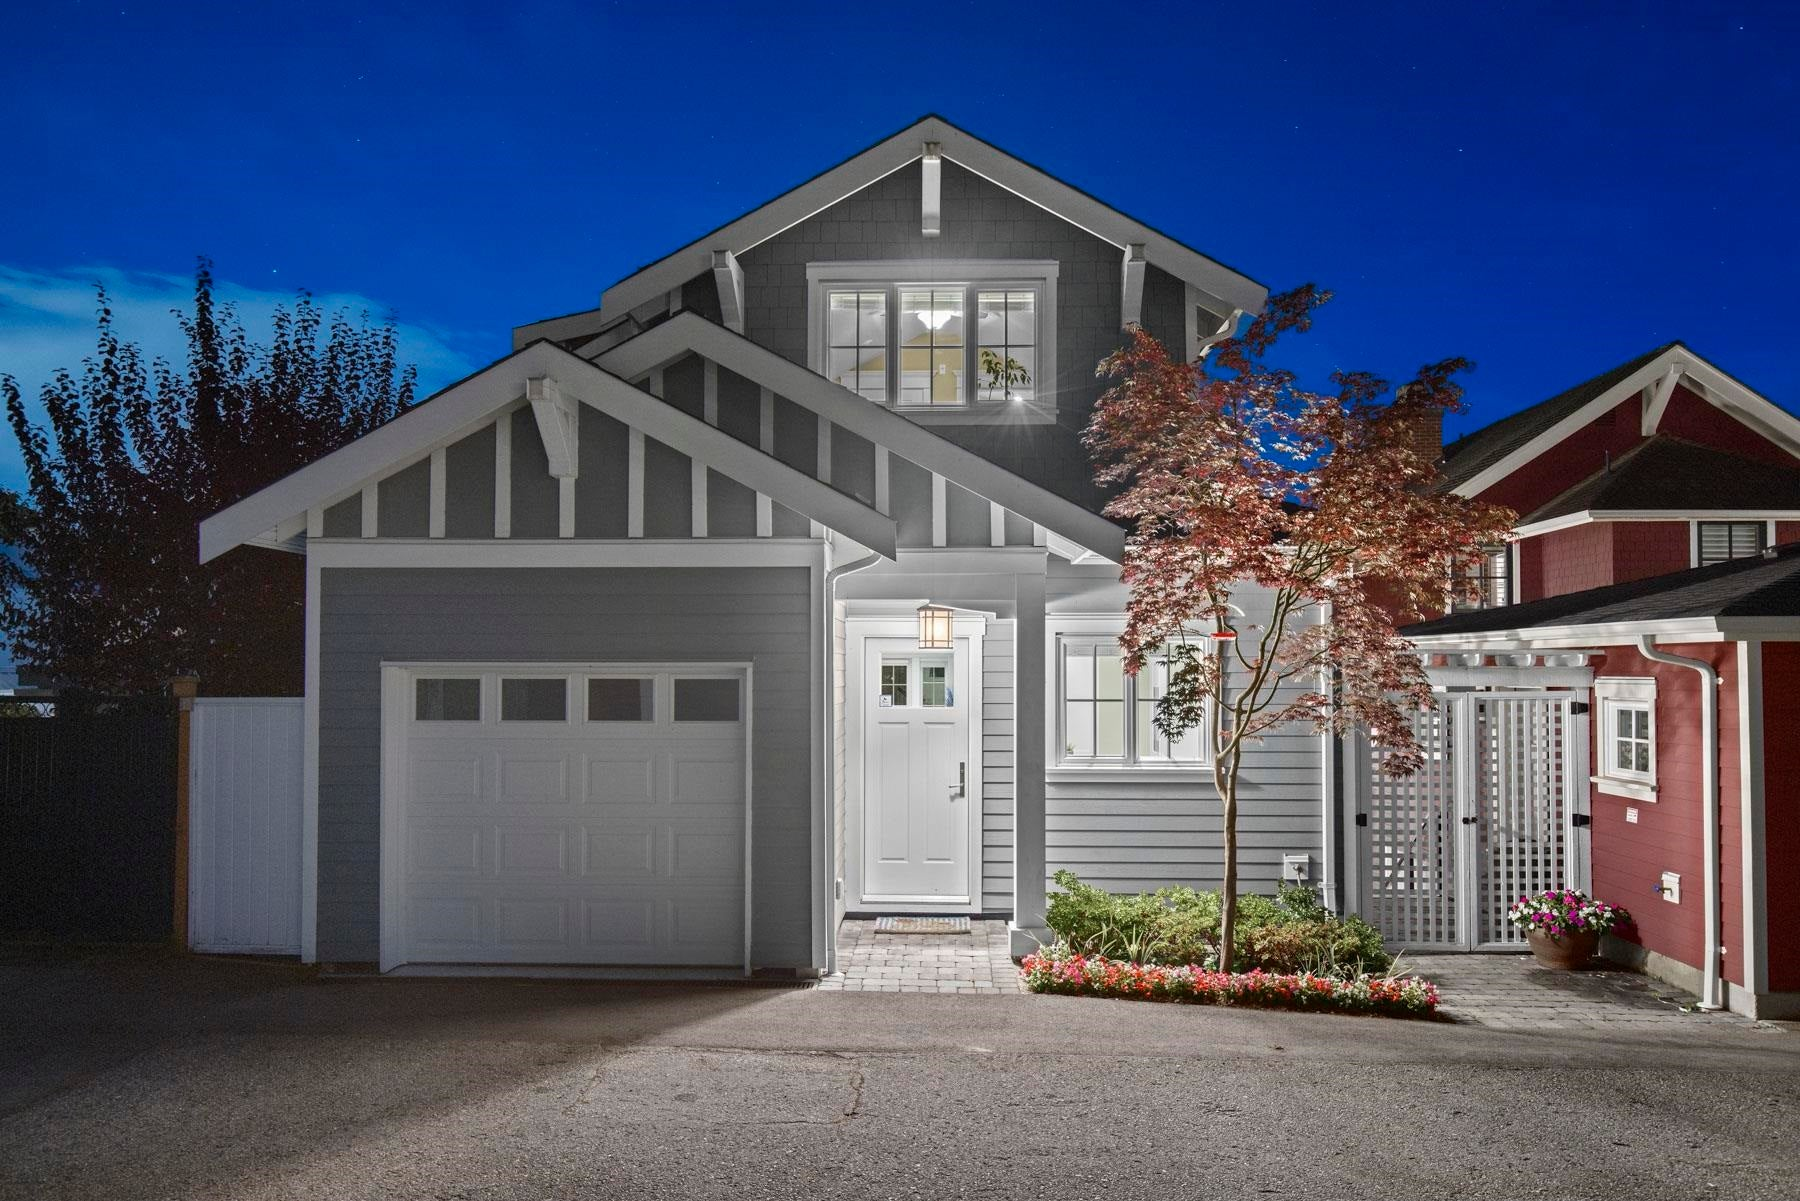 1421 GORDON AVENUE - Ambleside House/Single Family for sale, 3 Bedrooms (R2617756) - #23